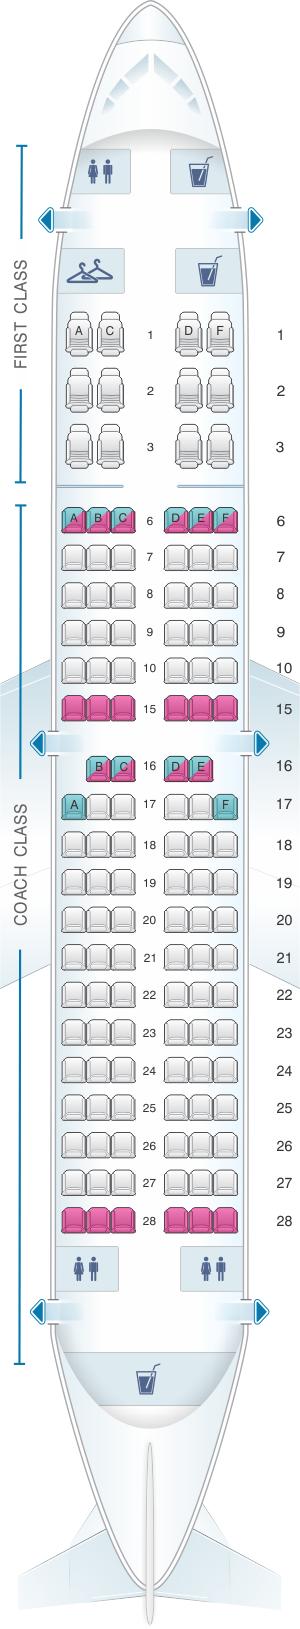 Seat map for Alaska Airlines - Horizon Air Boeing B737 700